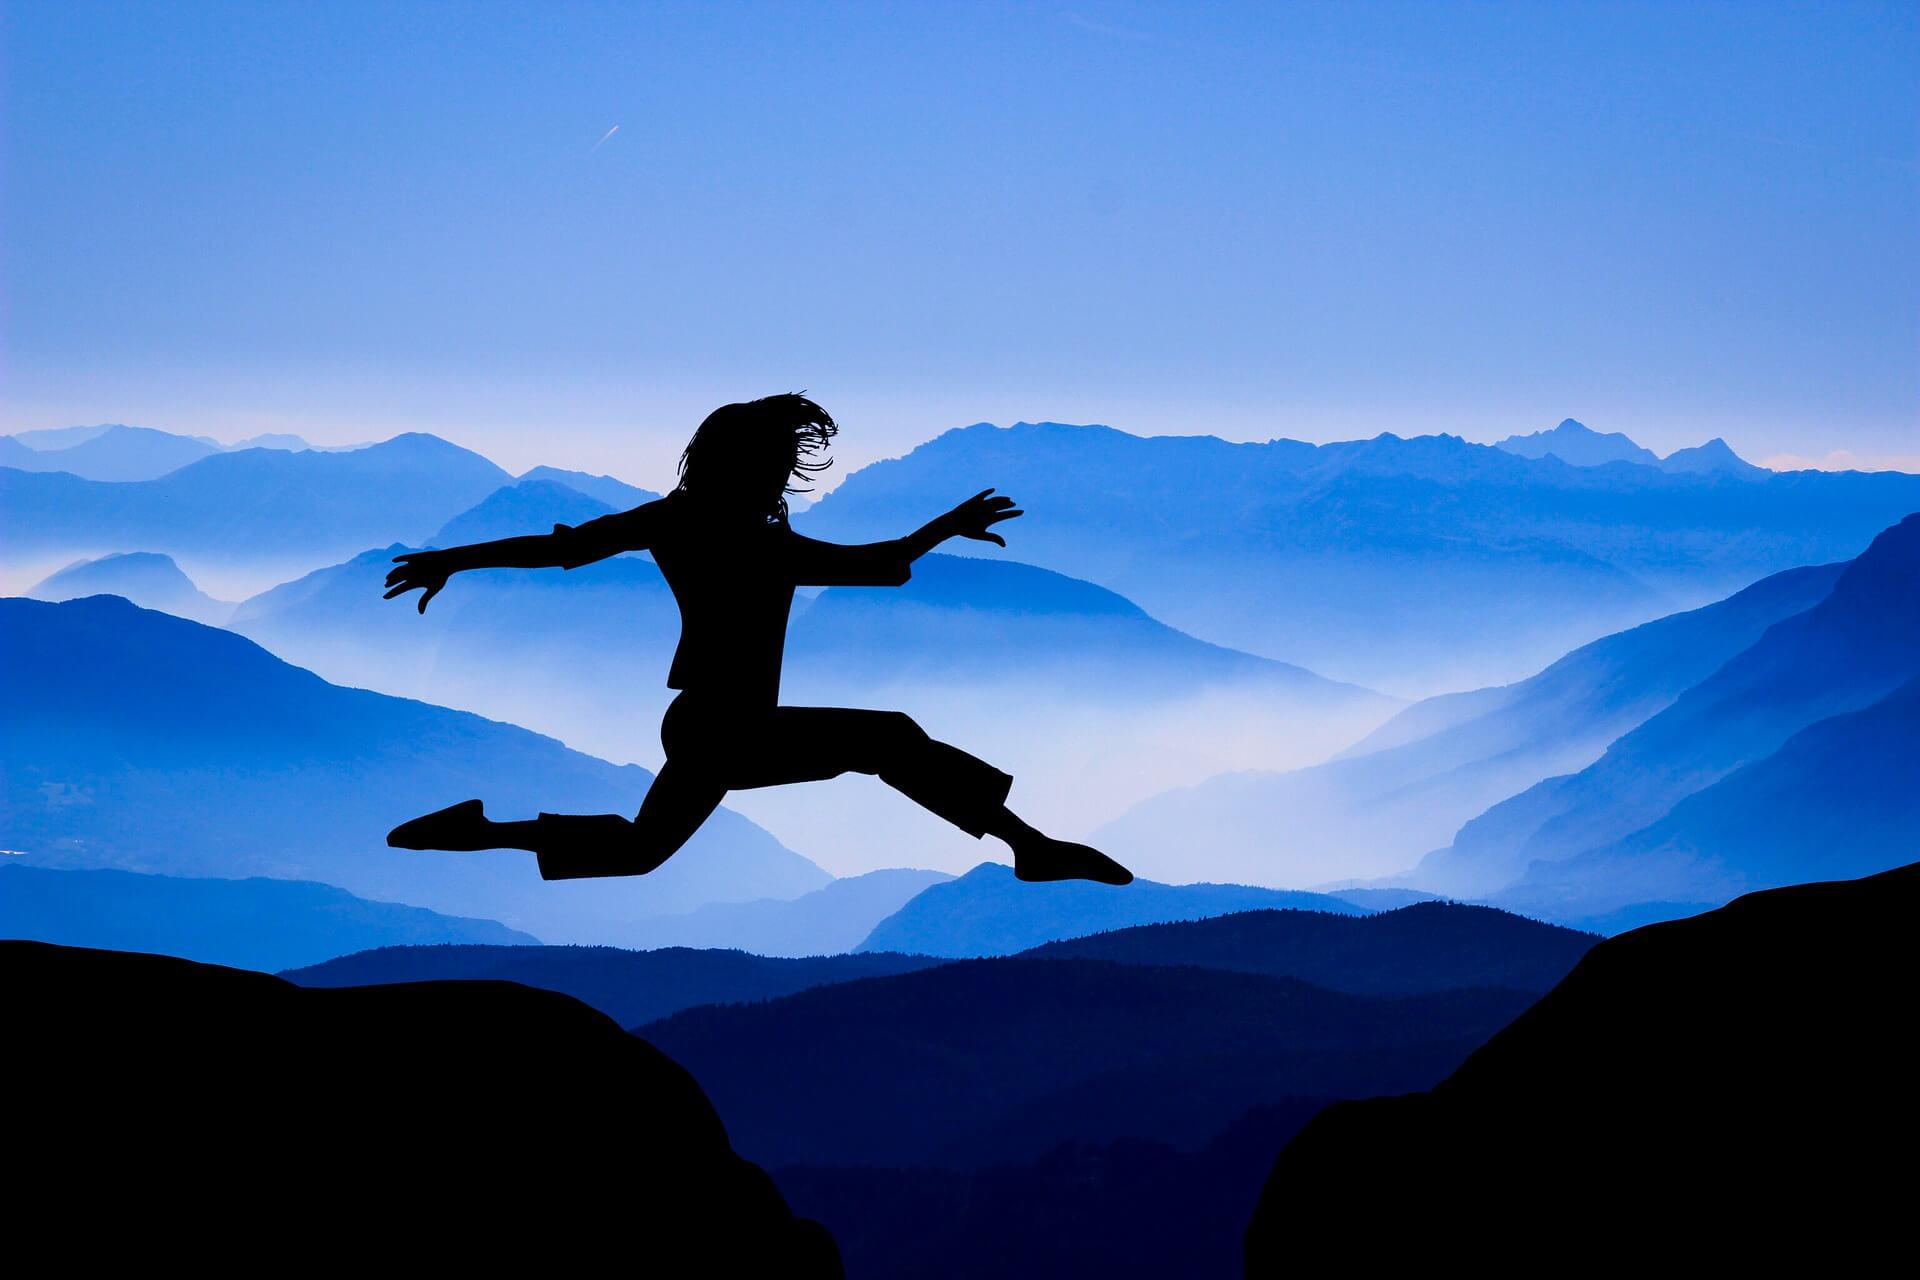 Apprendre à se lancer et réussir!